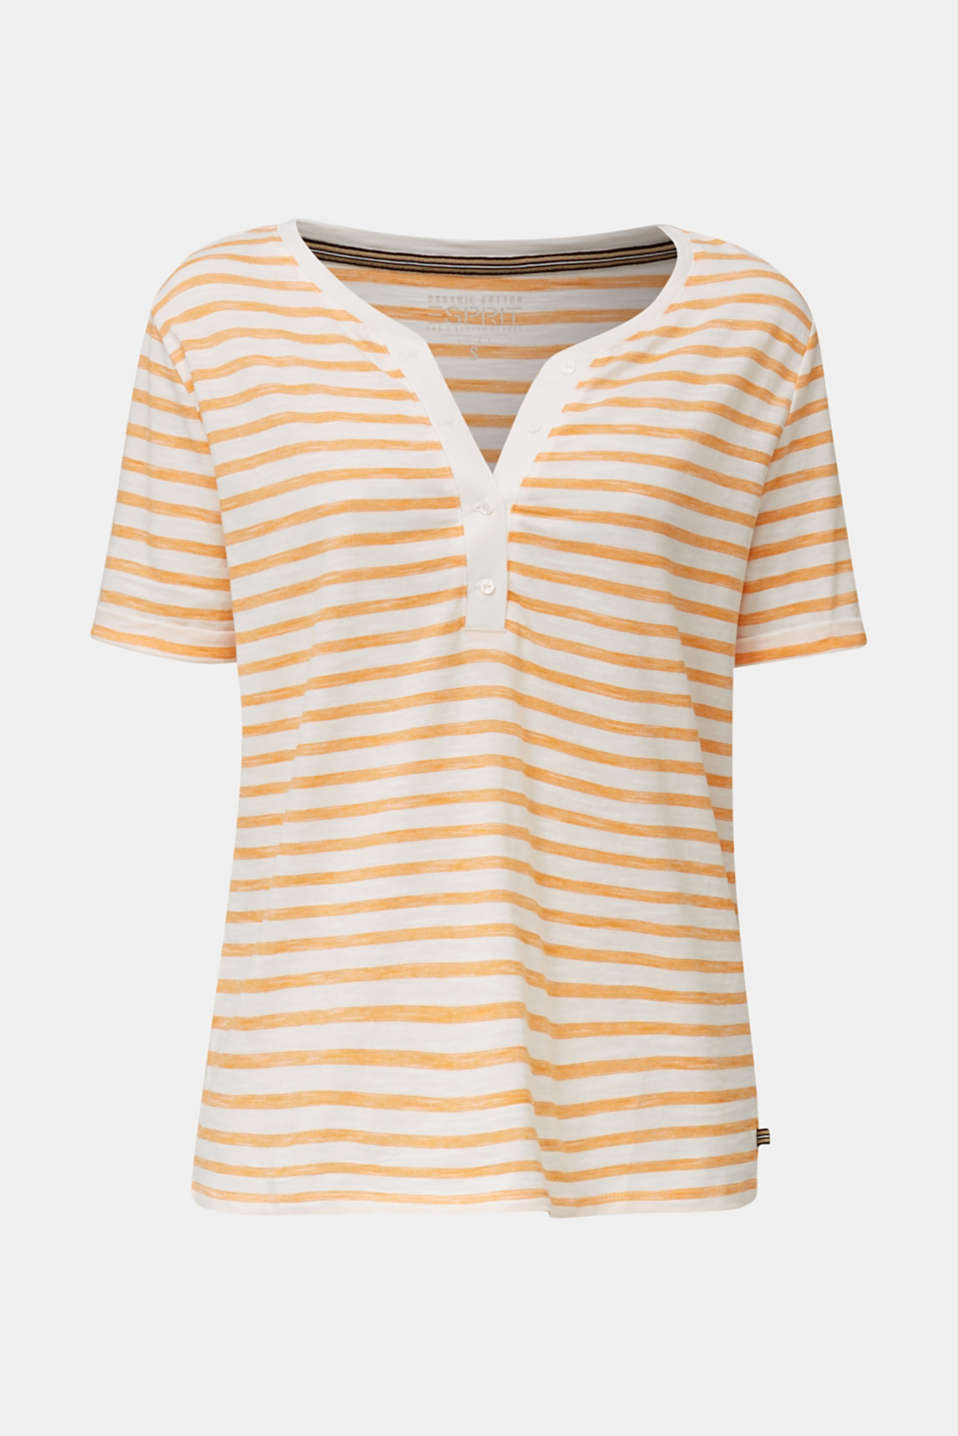 Striped Henley T-shirt, 100% organic cotton, ORANGE 4, detail image number 7